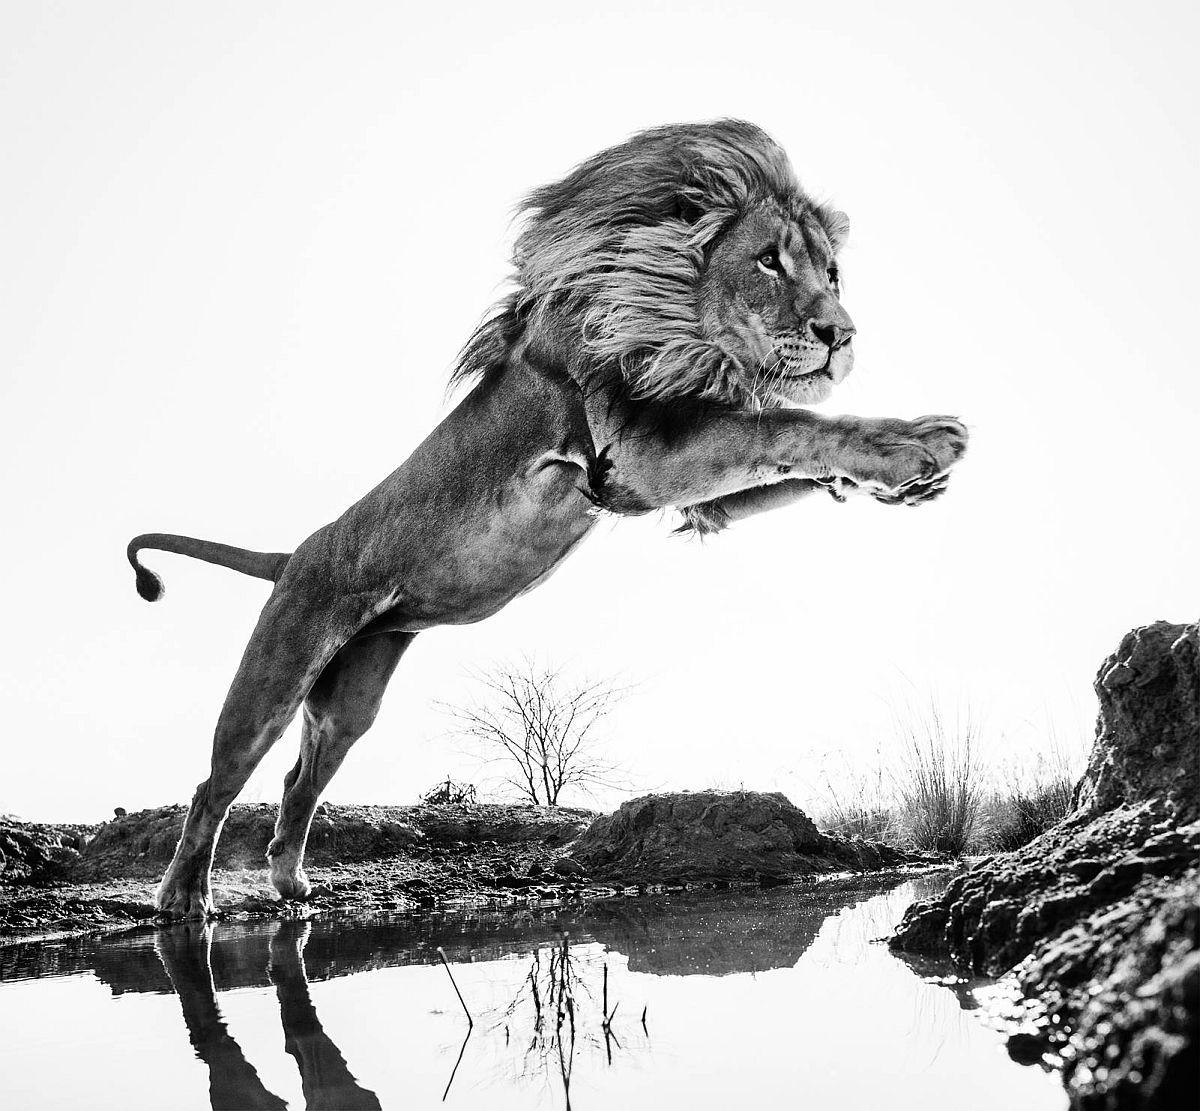 david-yarrow-wild-encounters-02